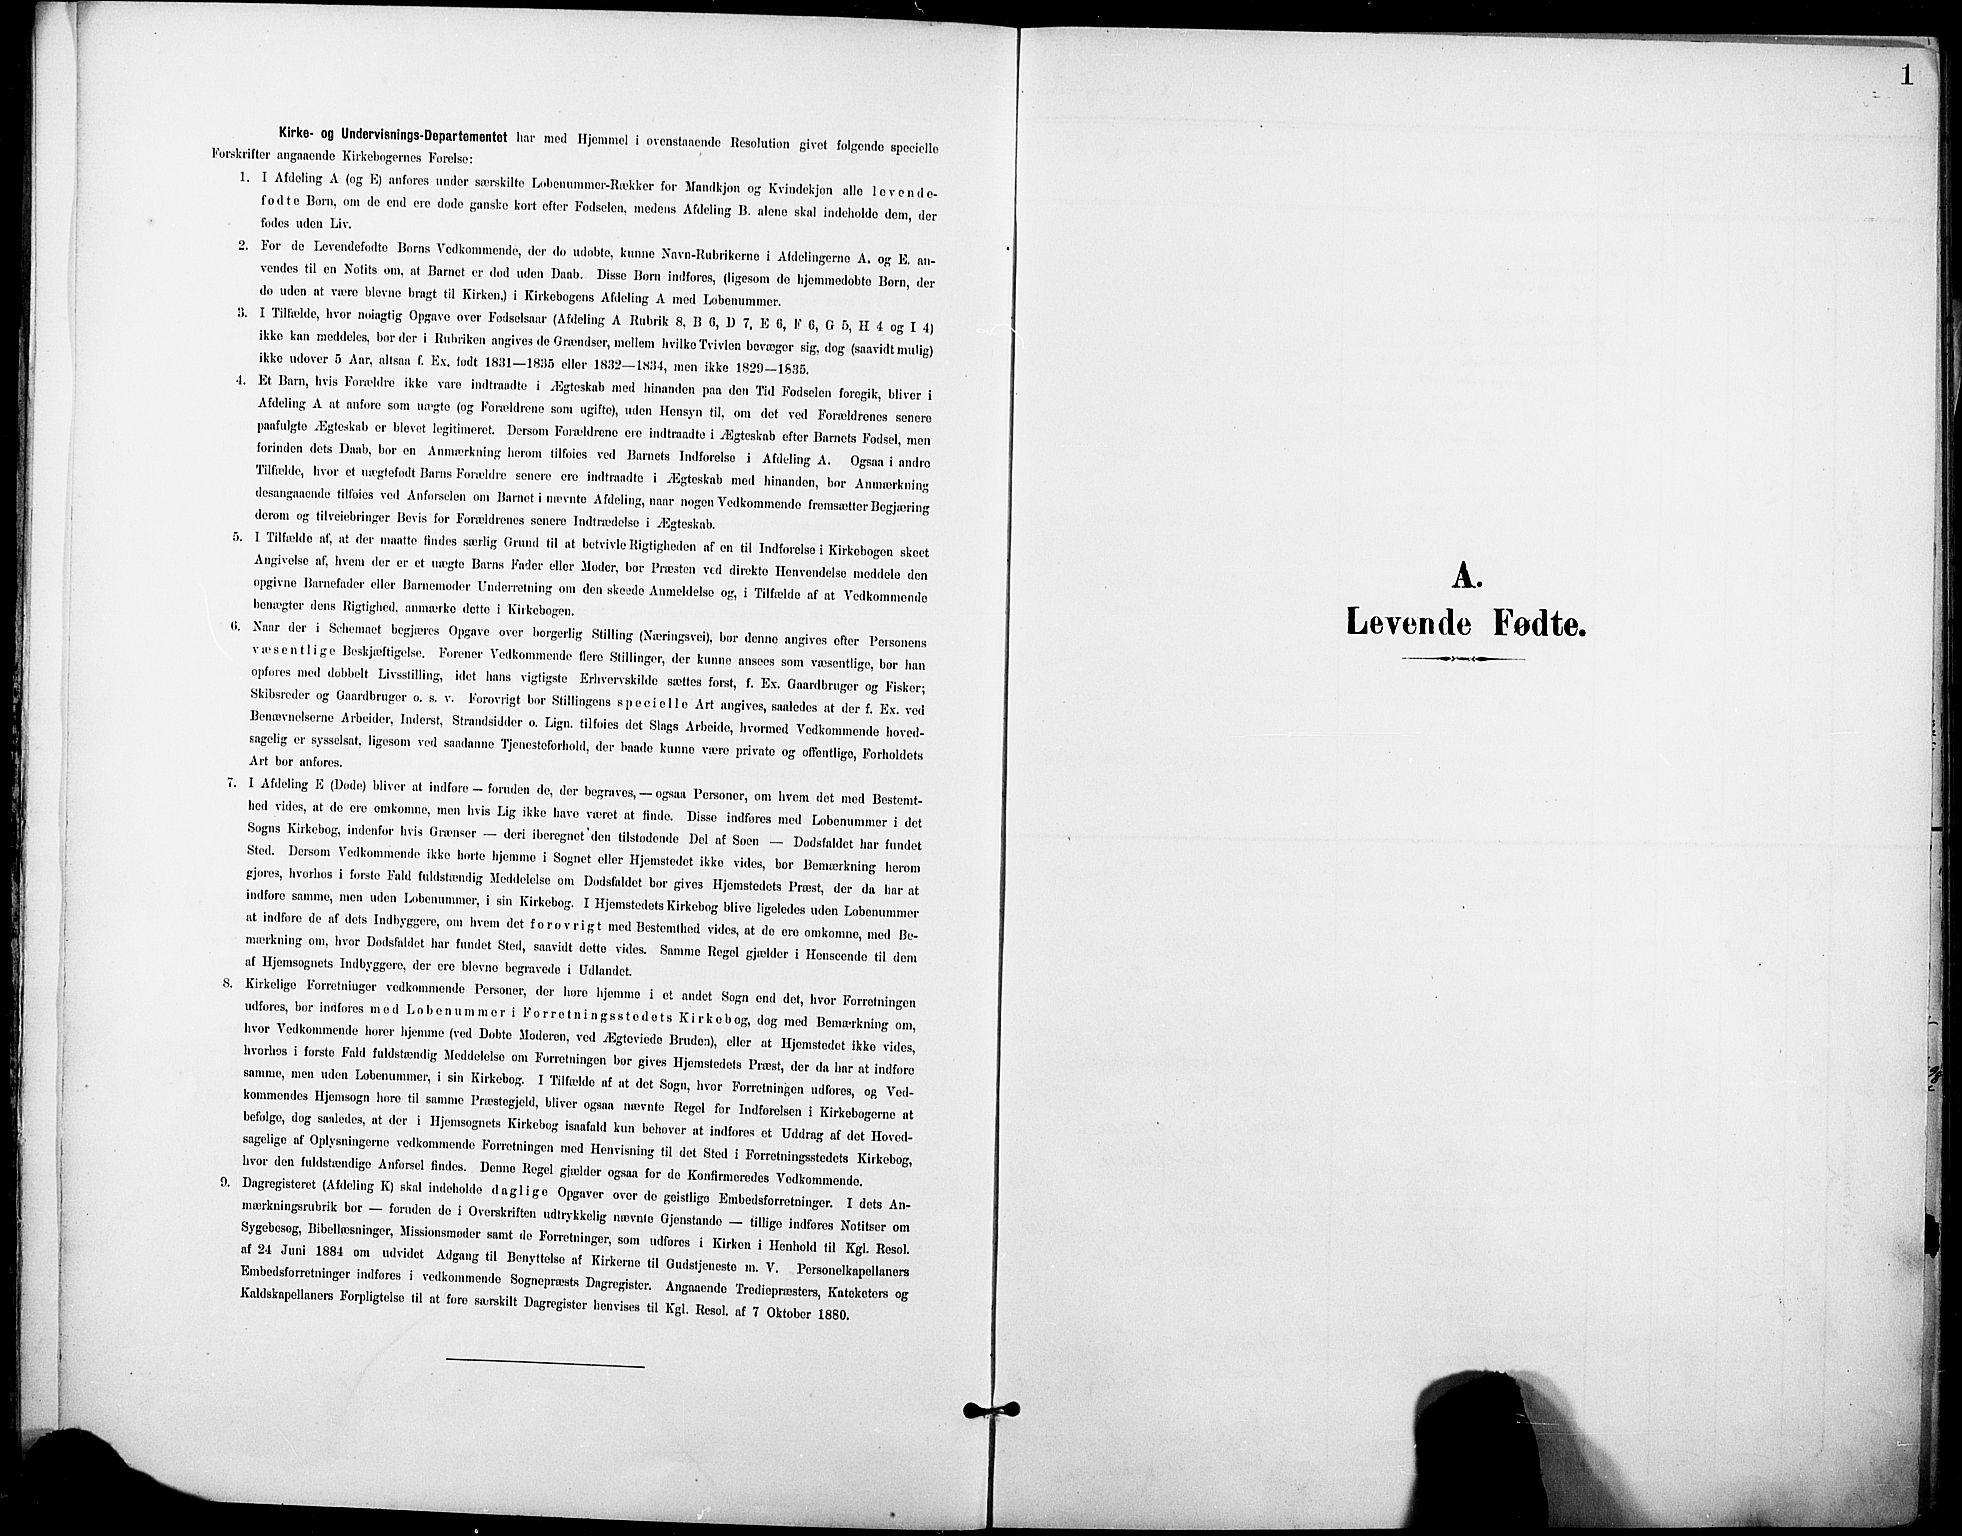 SAKO, Holla kirkebøker, F/Fa/L0010: Ministerialbok nr. 10, 1897-1907, s. 1